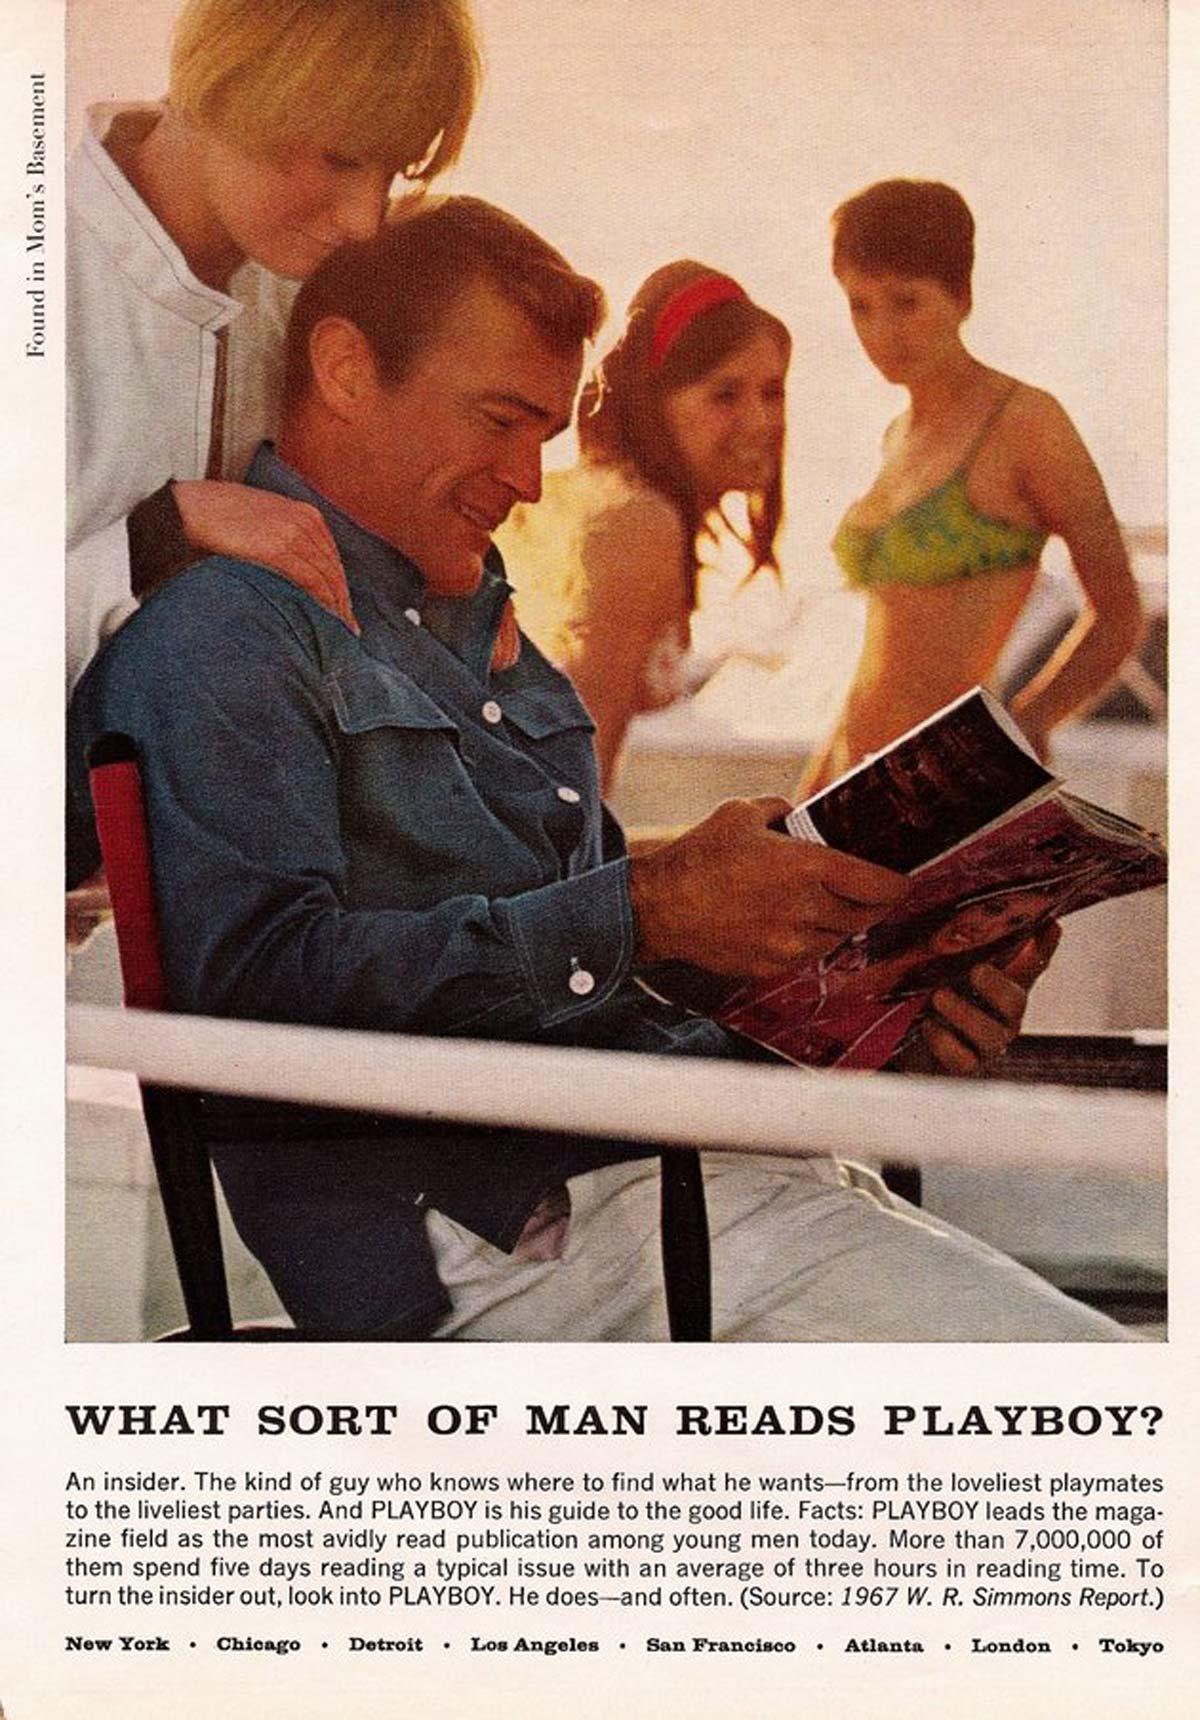 Playboy. Quem lê?